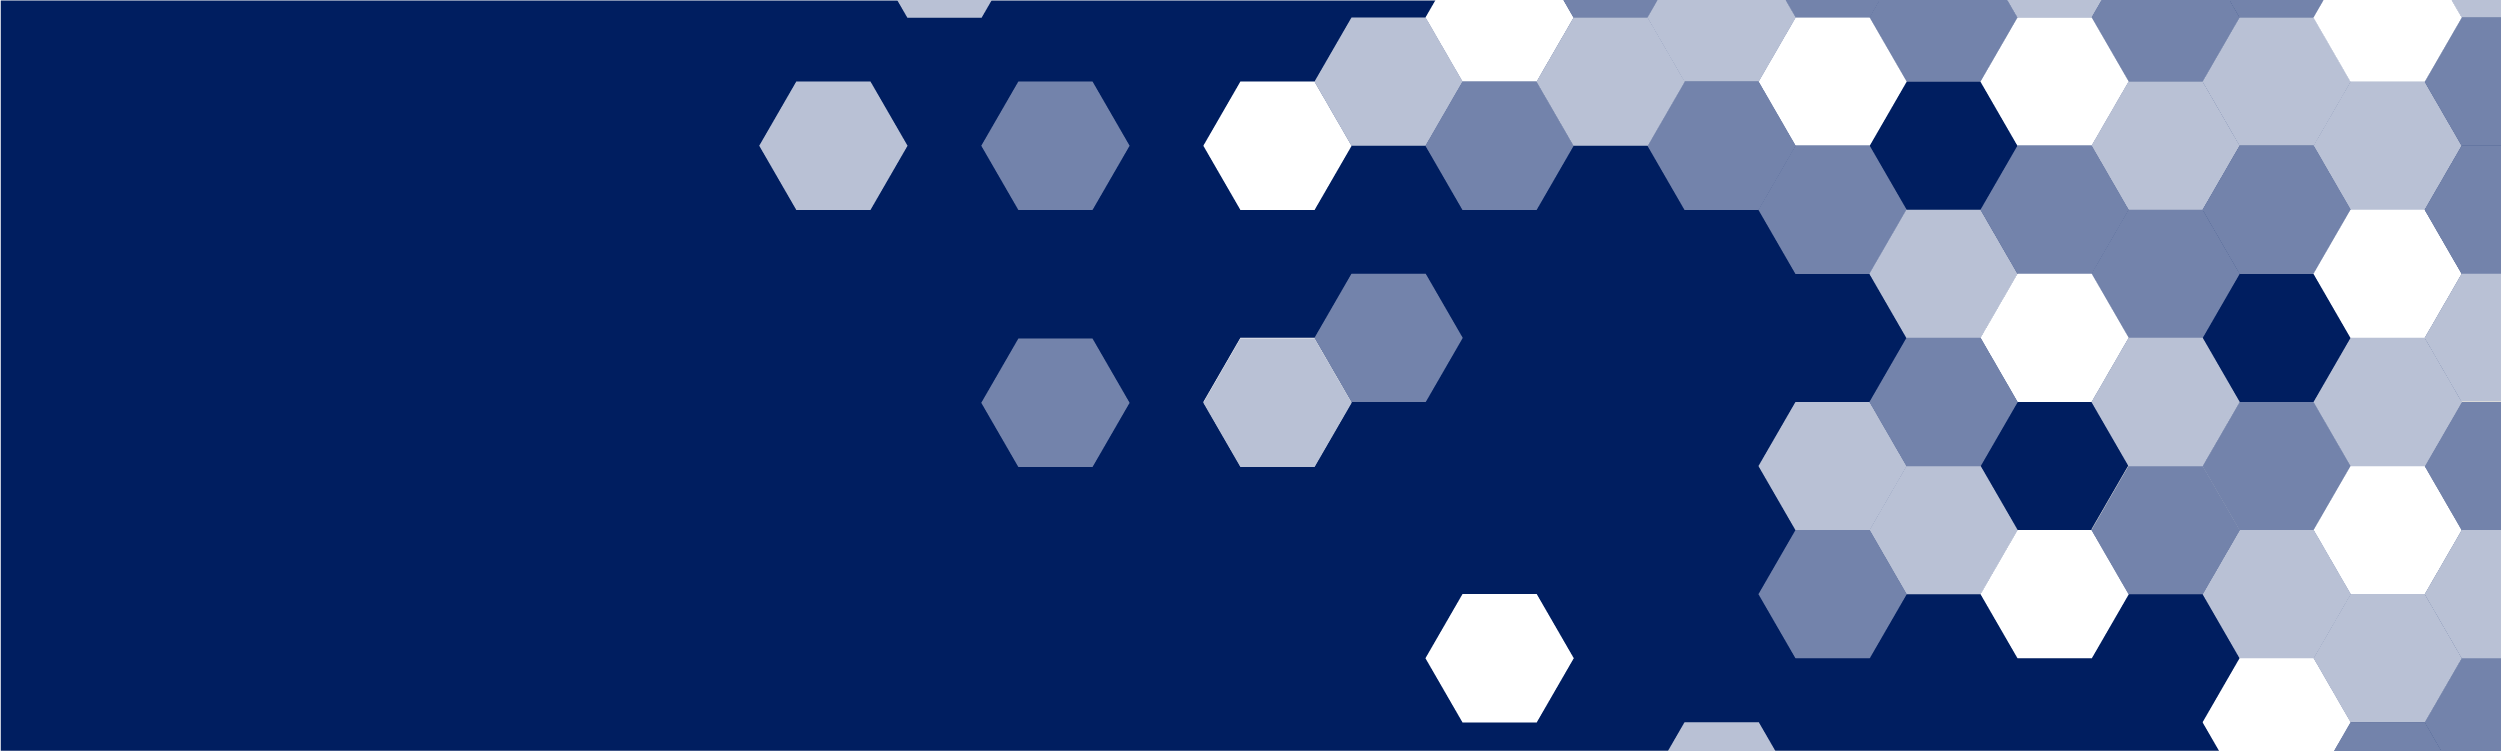 Sub Banner Default Image